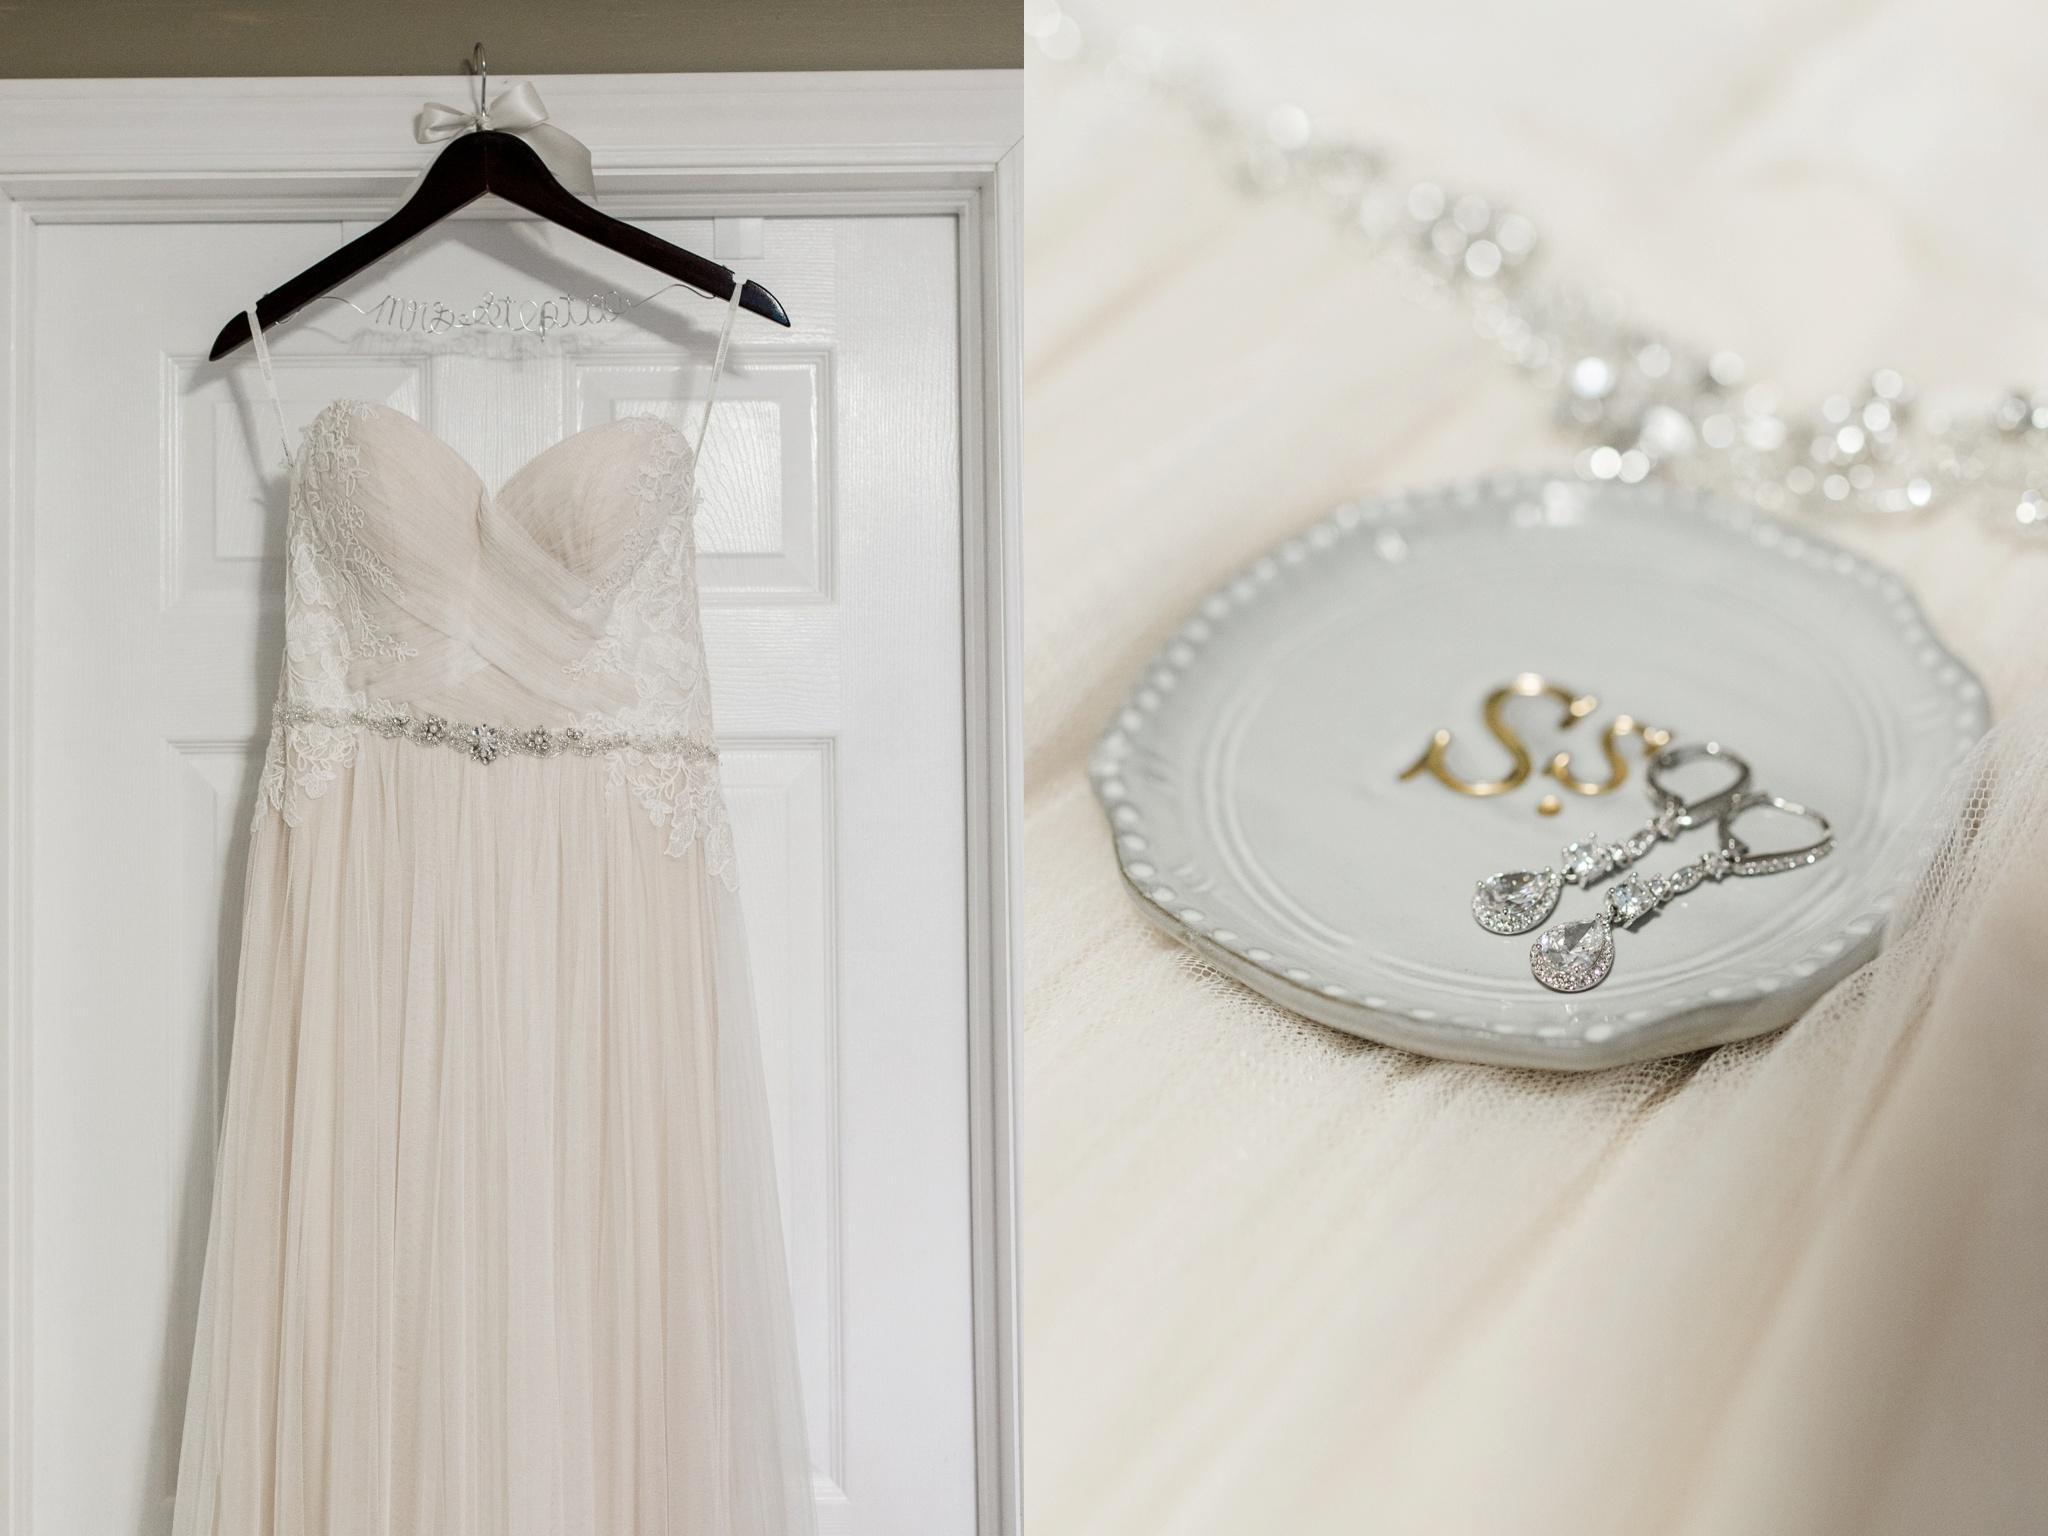 Maggie Sorreto Dress